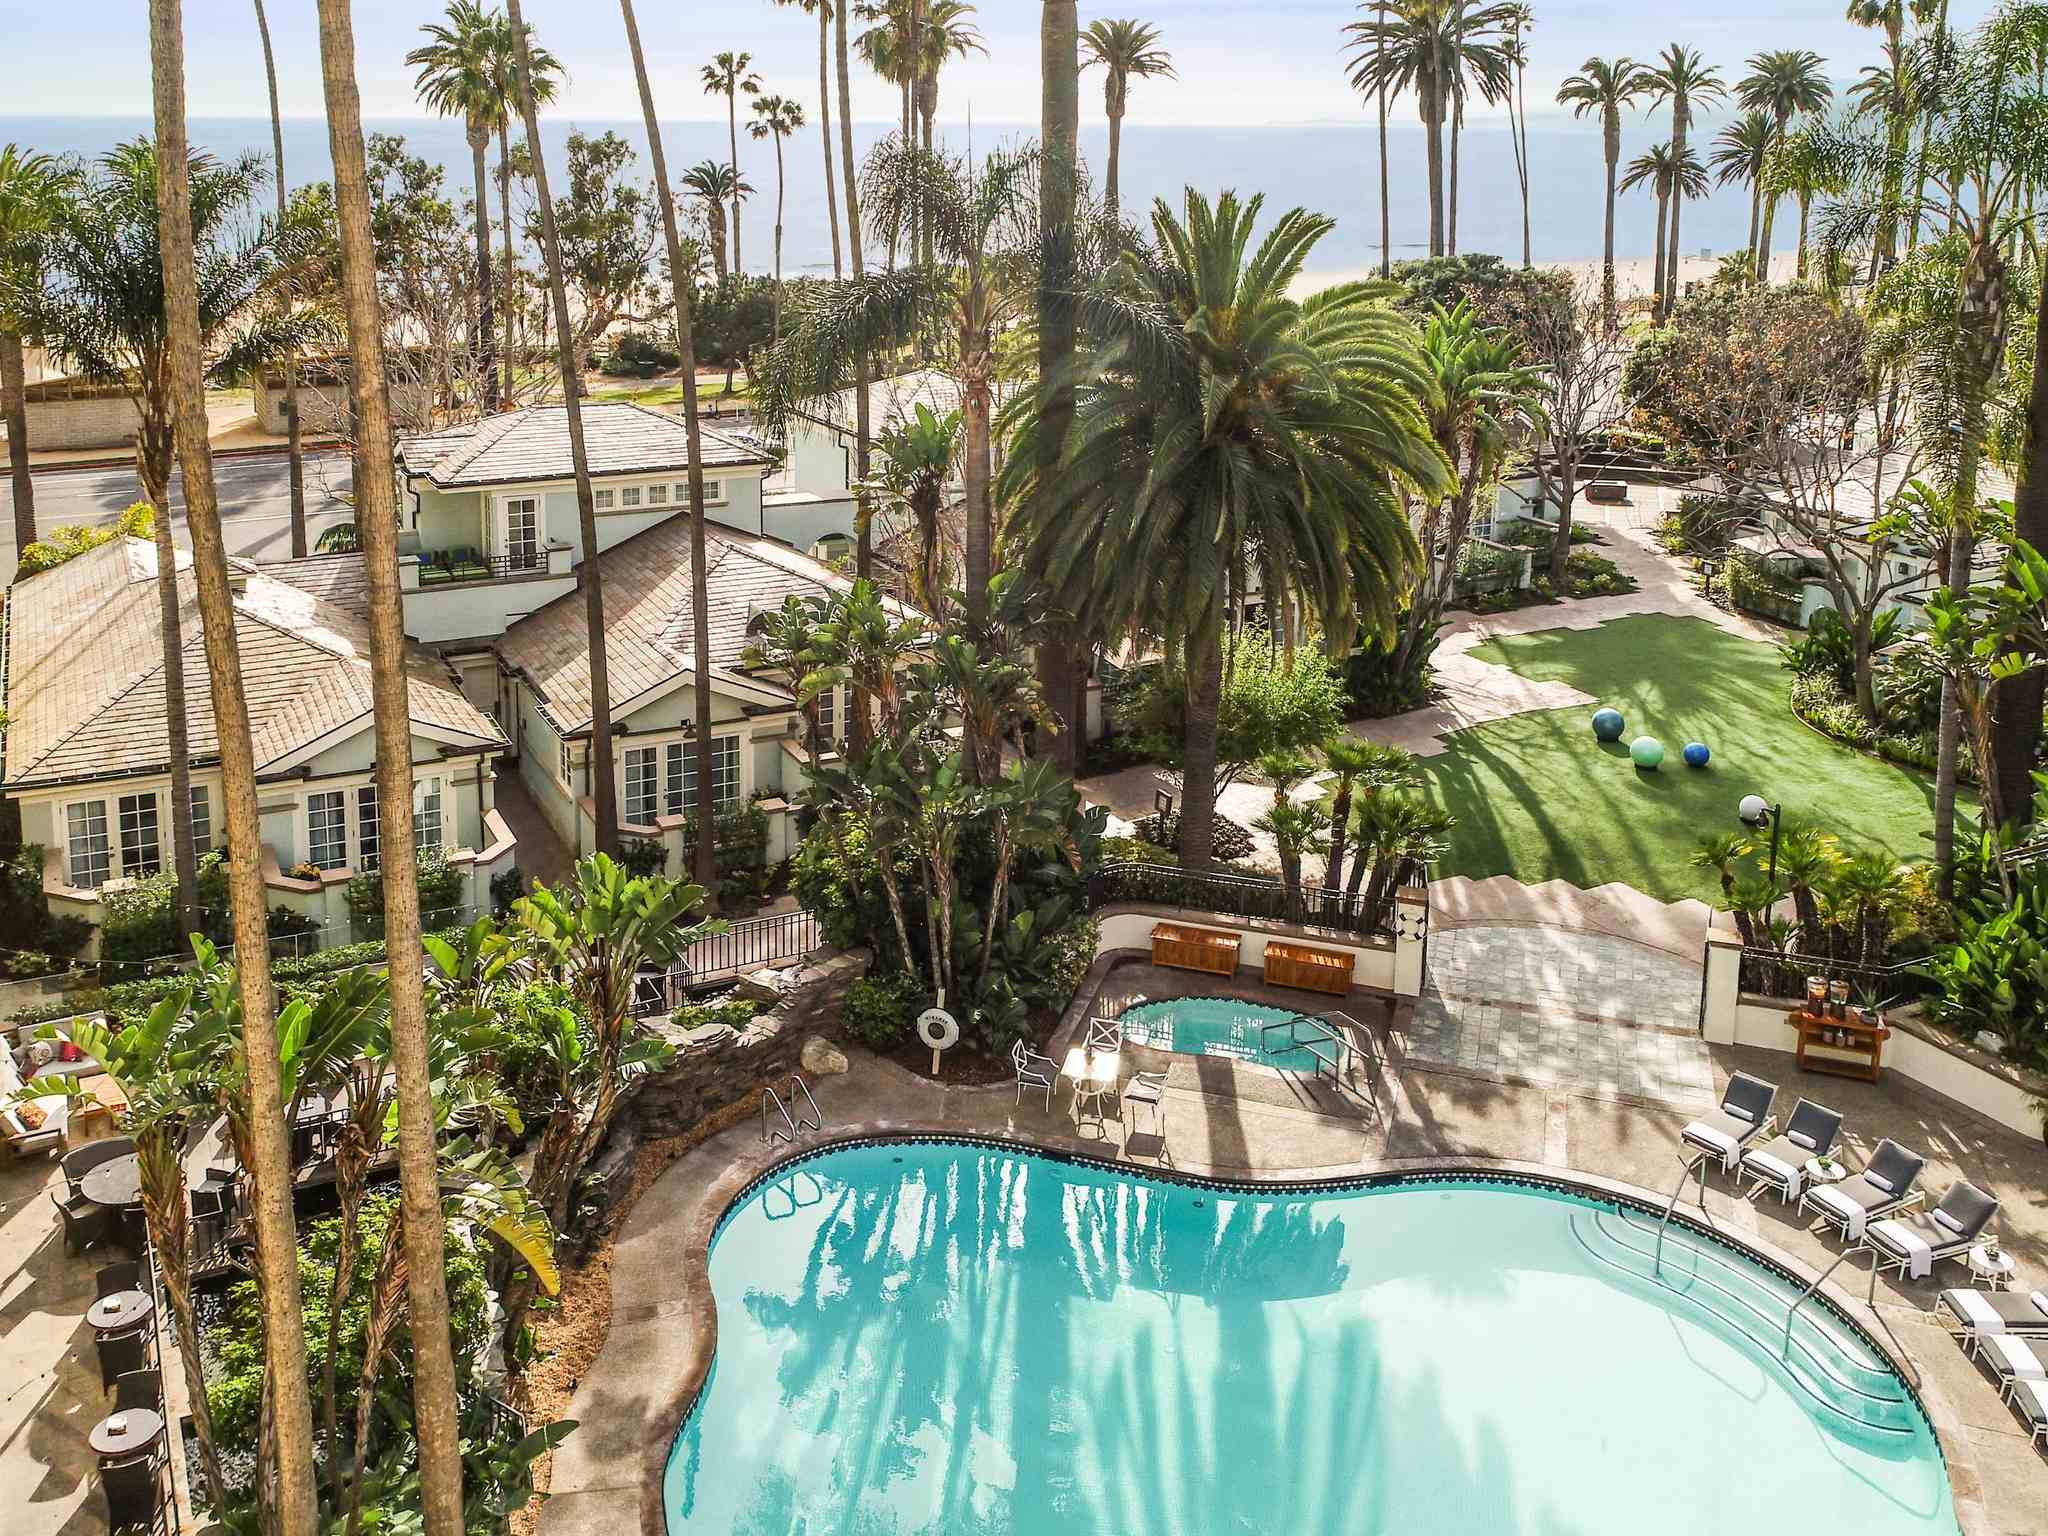 Hotell – Fairmont Miramar - Hotel & Bungalows